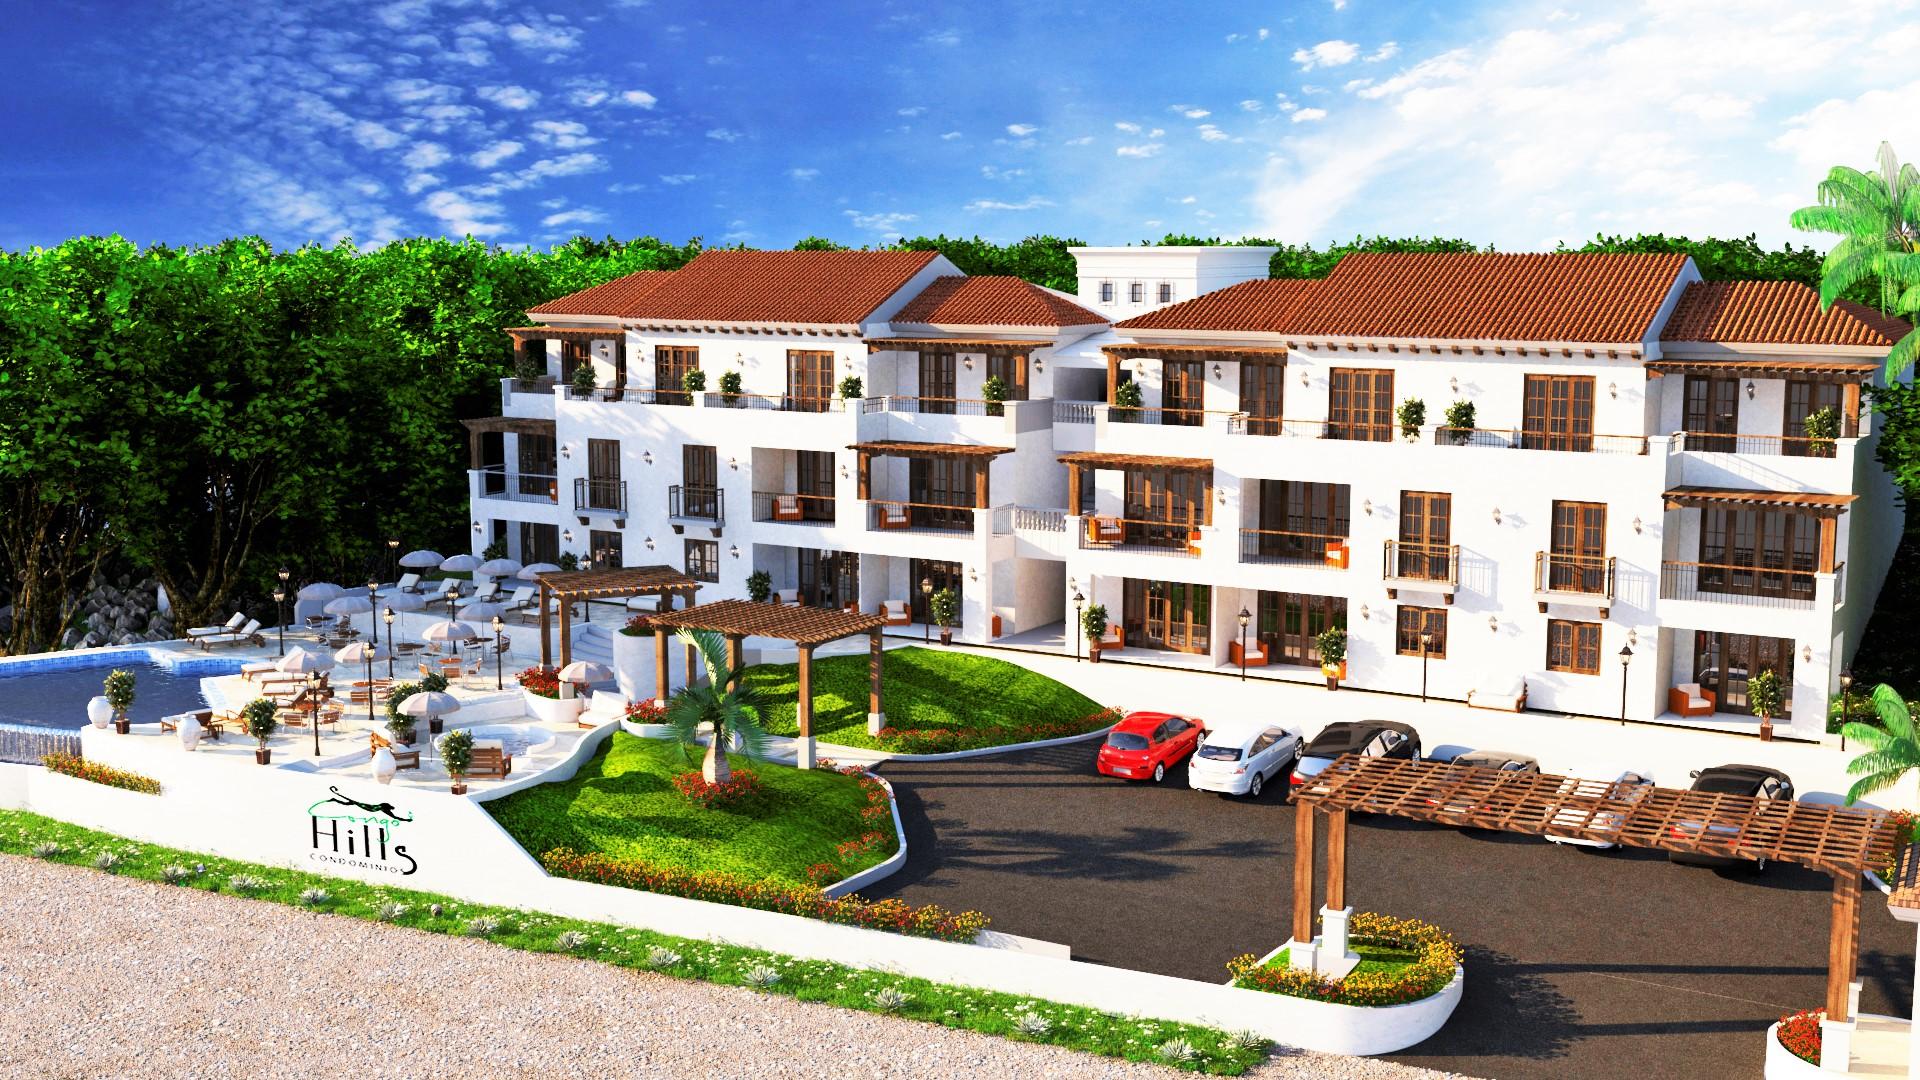 Partner with the developer or take over the condo development in San Juan Del Sur